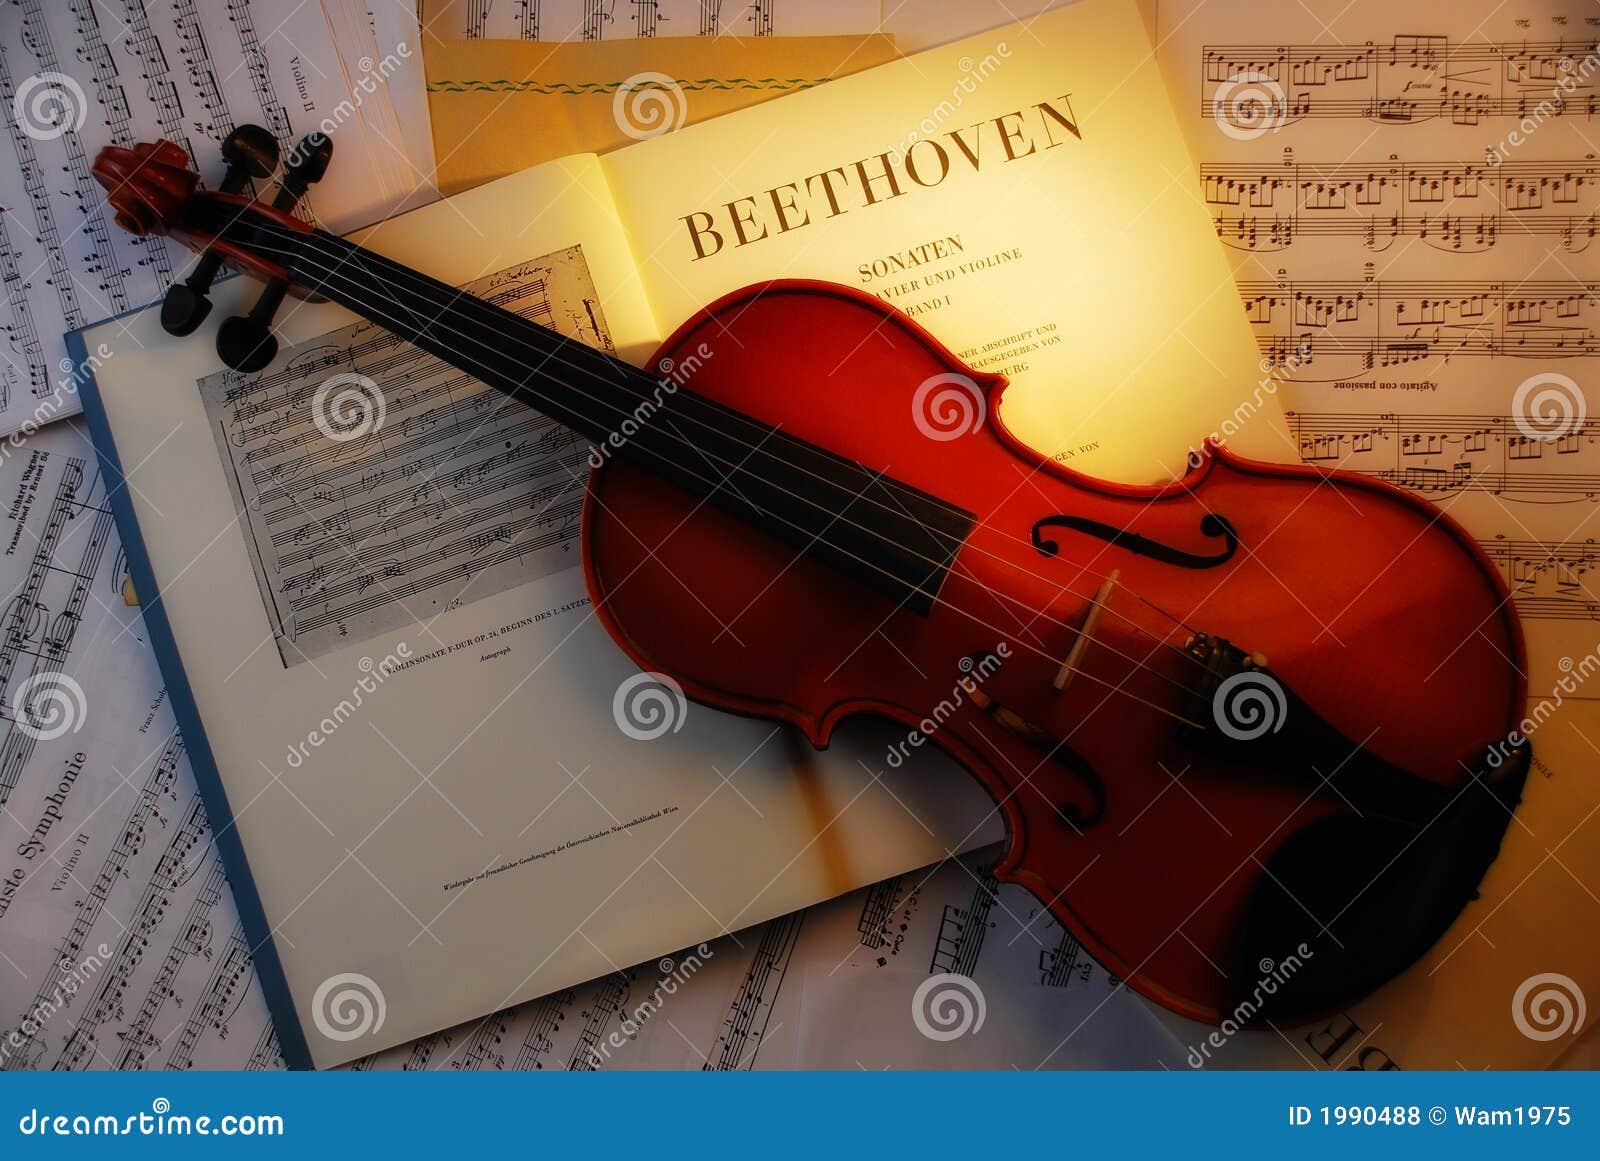 VIOLINO (Beethoven 4)